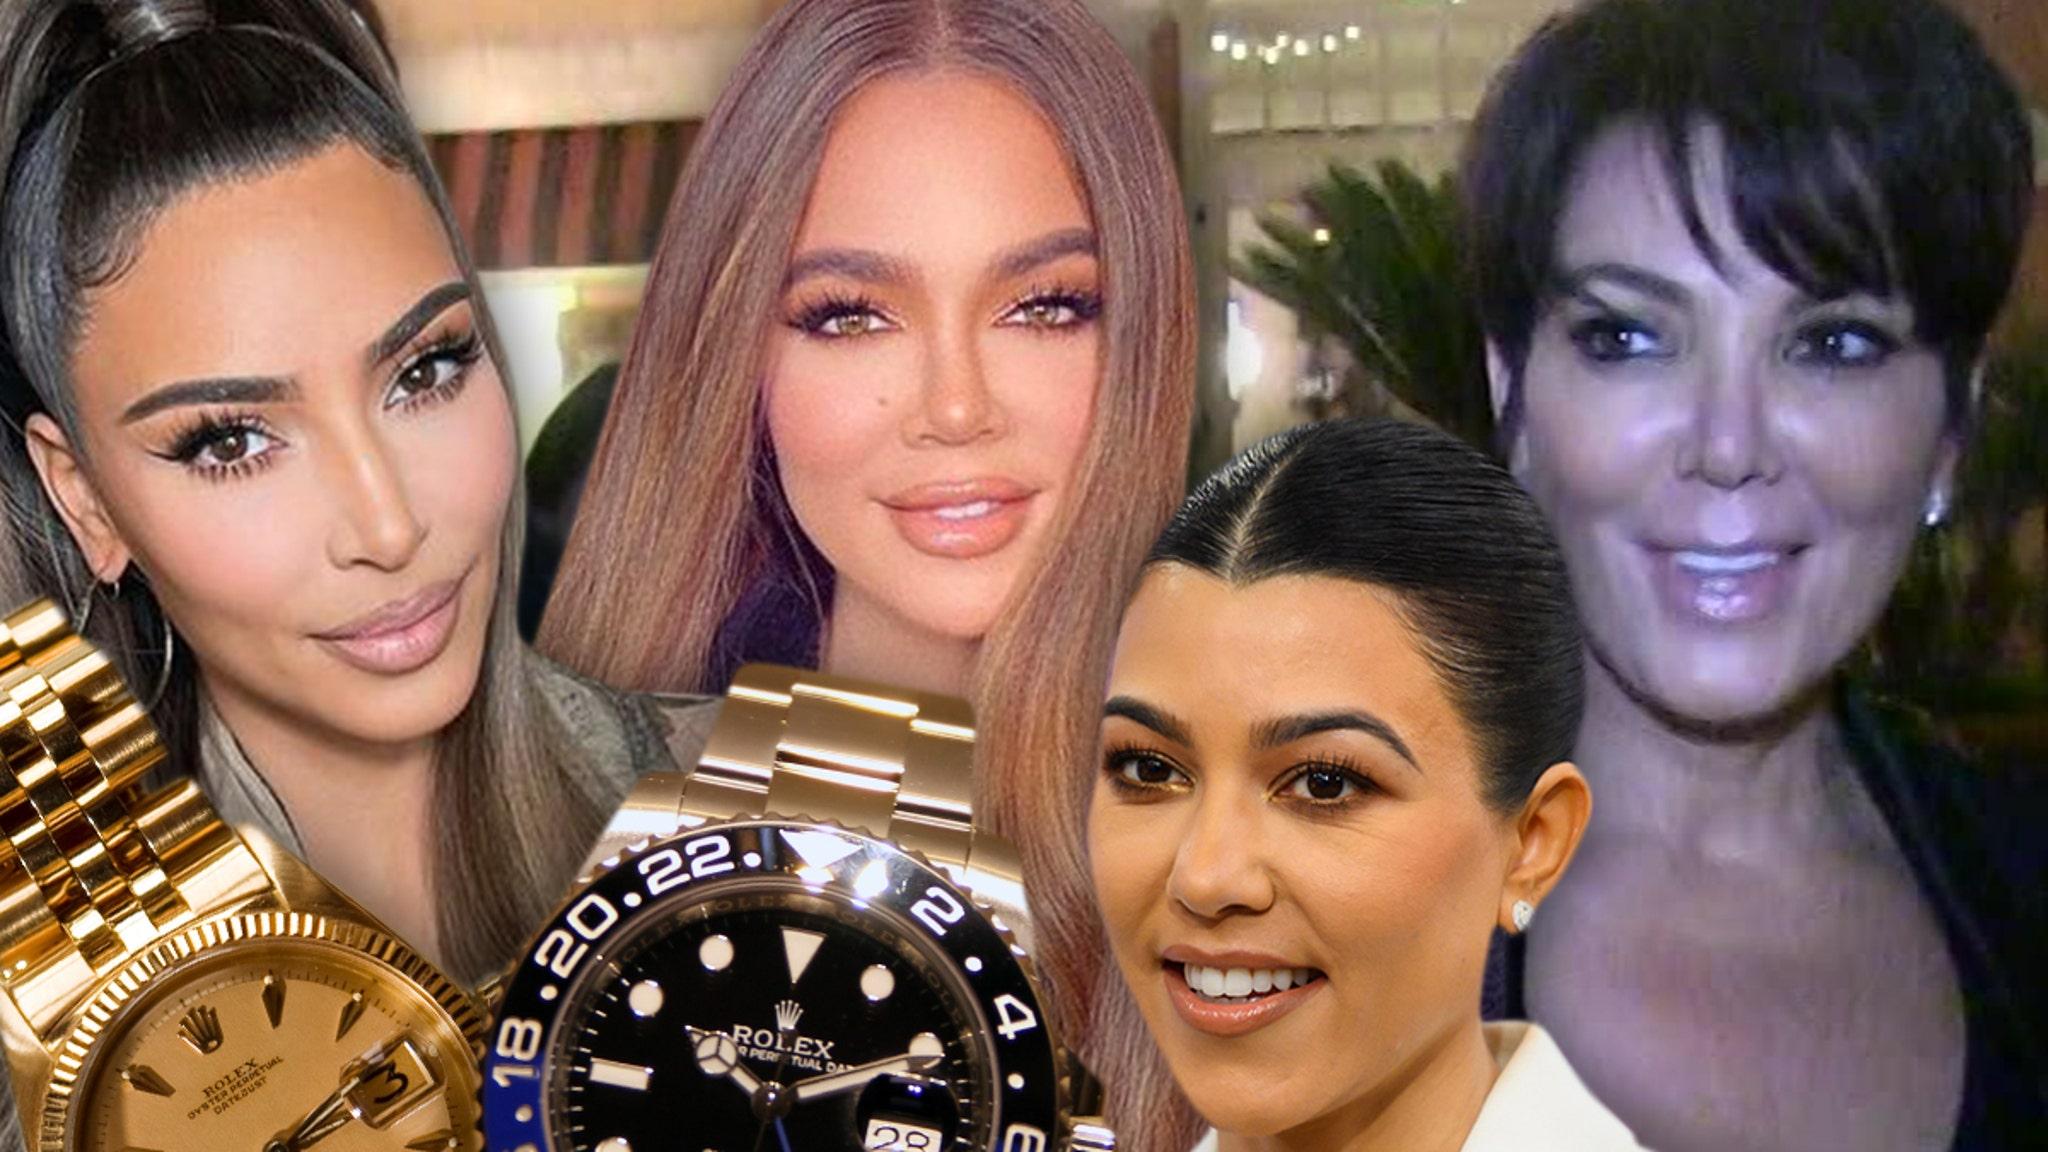 Kardashians Give 'KUWTK' Crew Rolex Watches After Final Episode